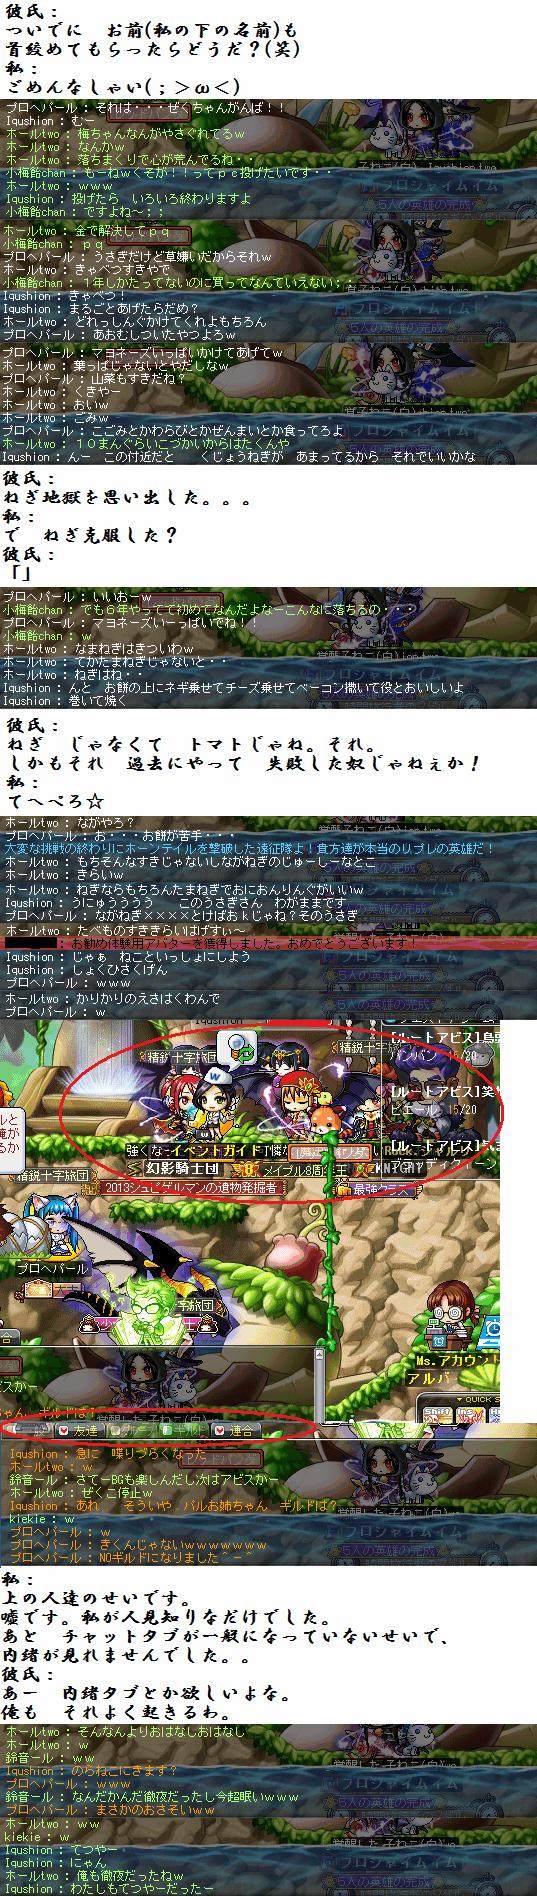 2013_0415_2232 _5